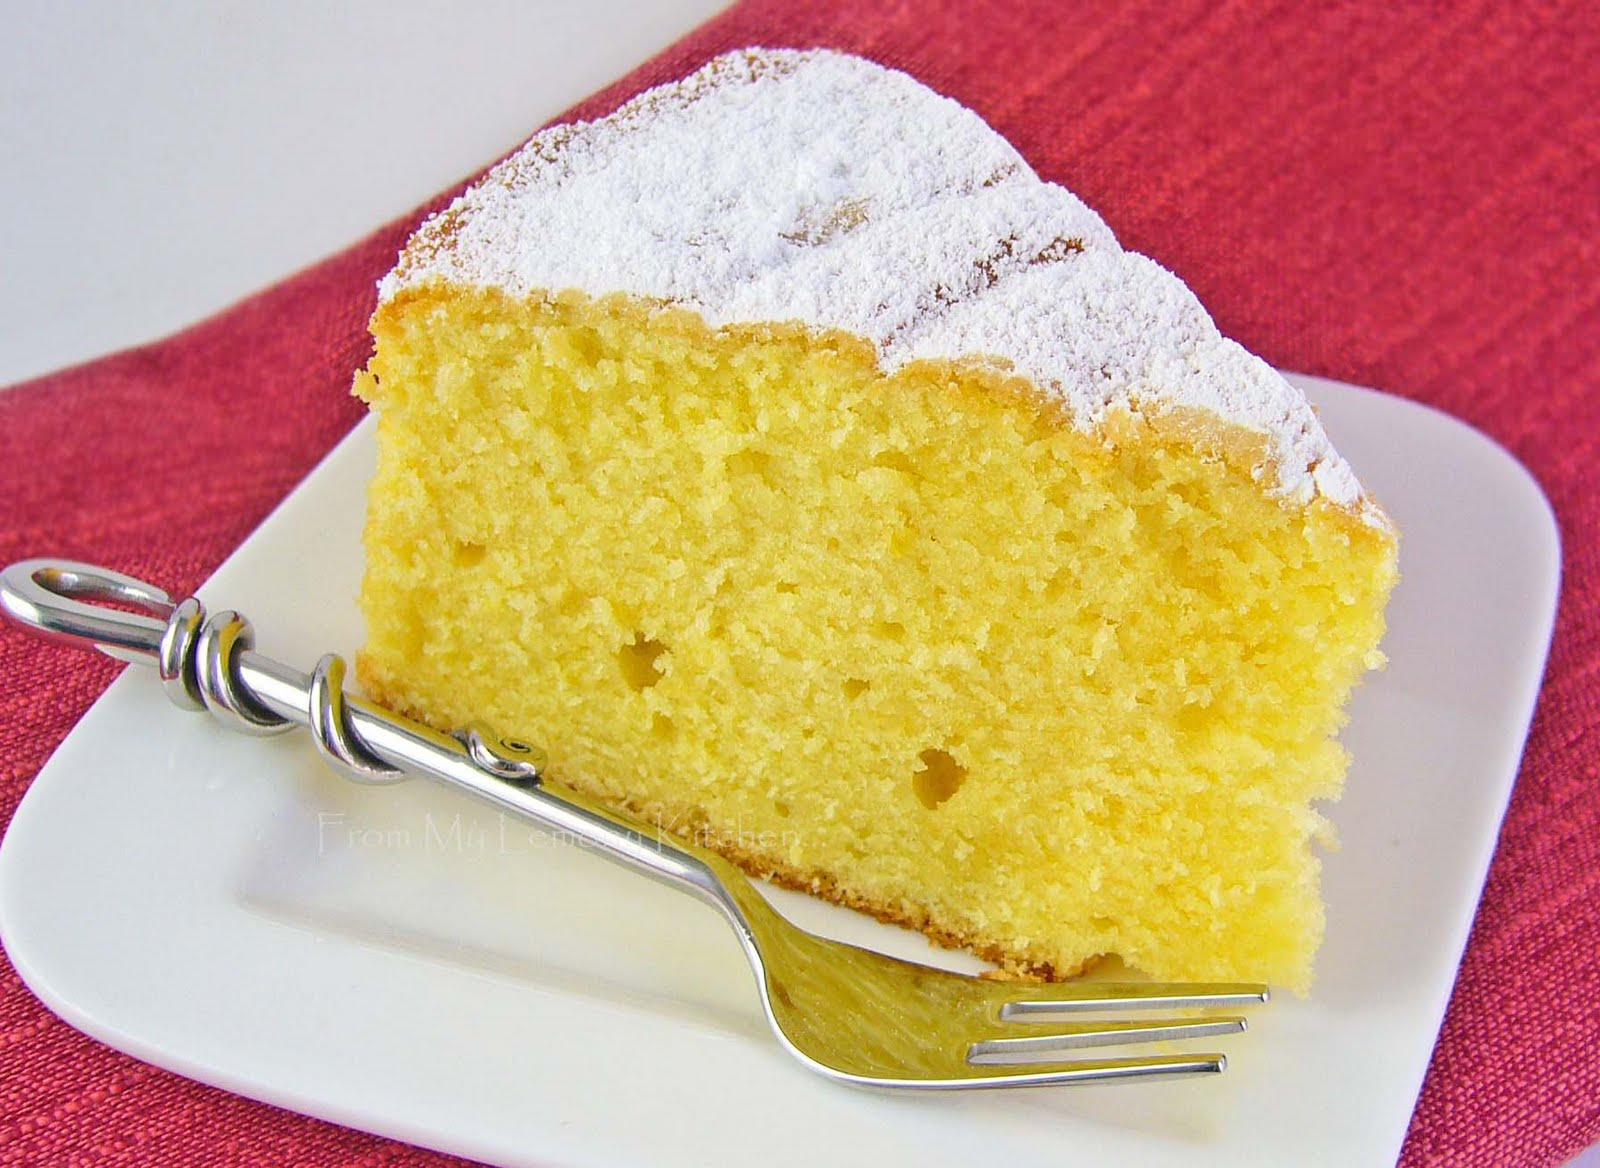 Lemon Pound Cake With Cake Mix And Sour Cream